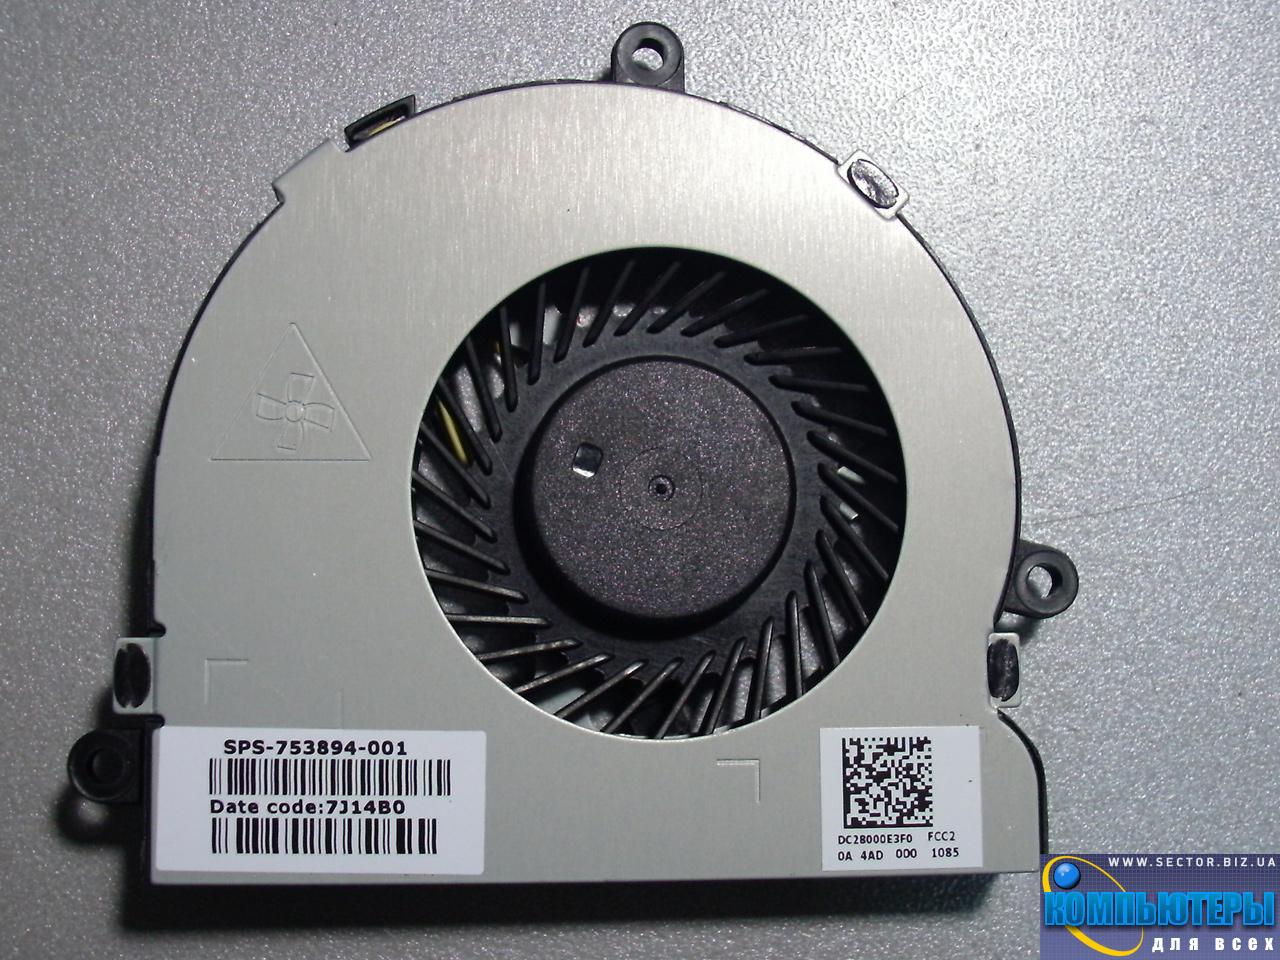 Кулер к ноутбуку Dell Inspiron 15R 3521 3721 5521 5535 5721 p/n: DFS470805CL0T FFG7. Фото № 4.